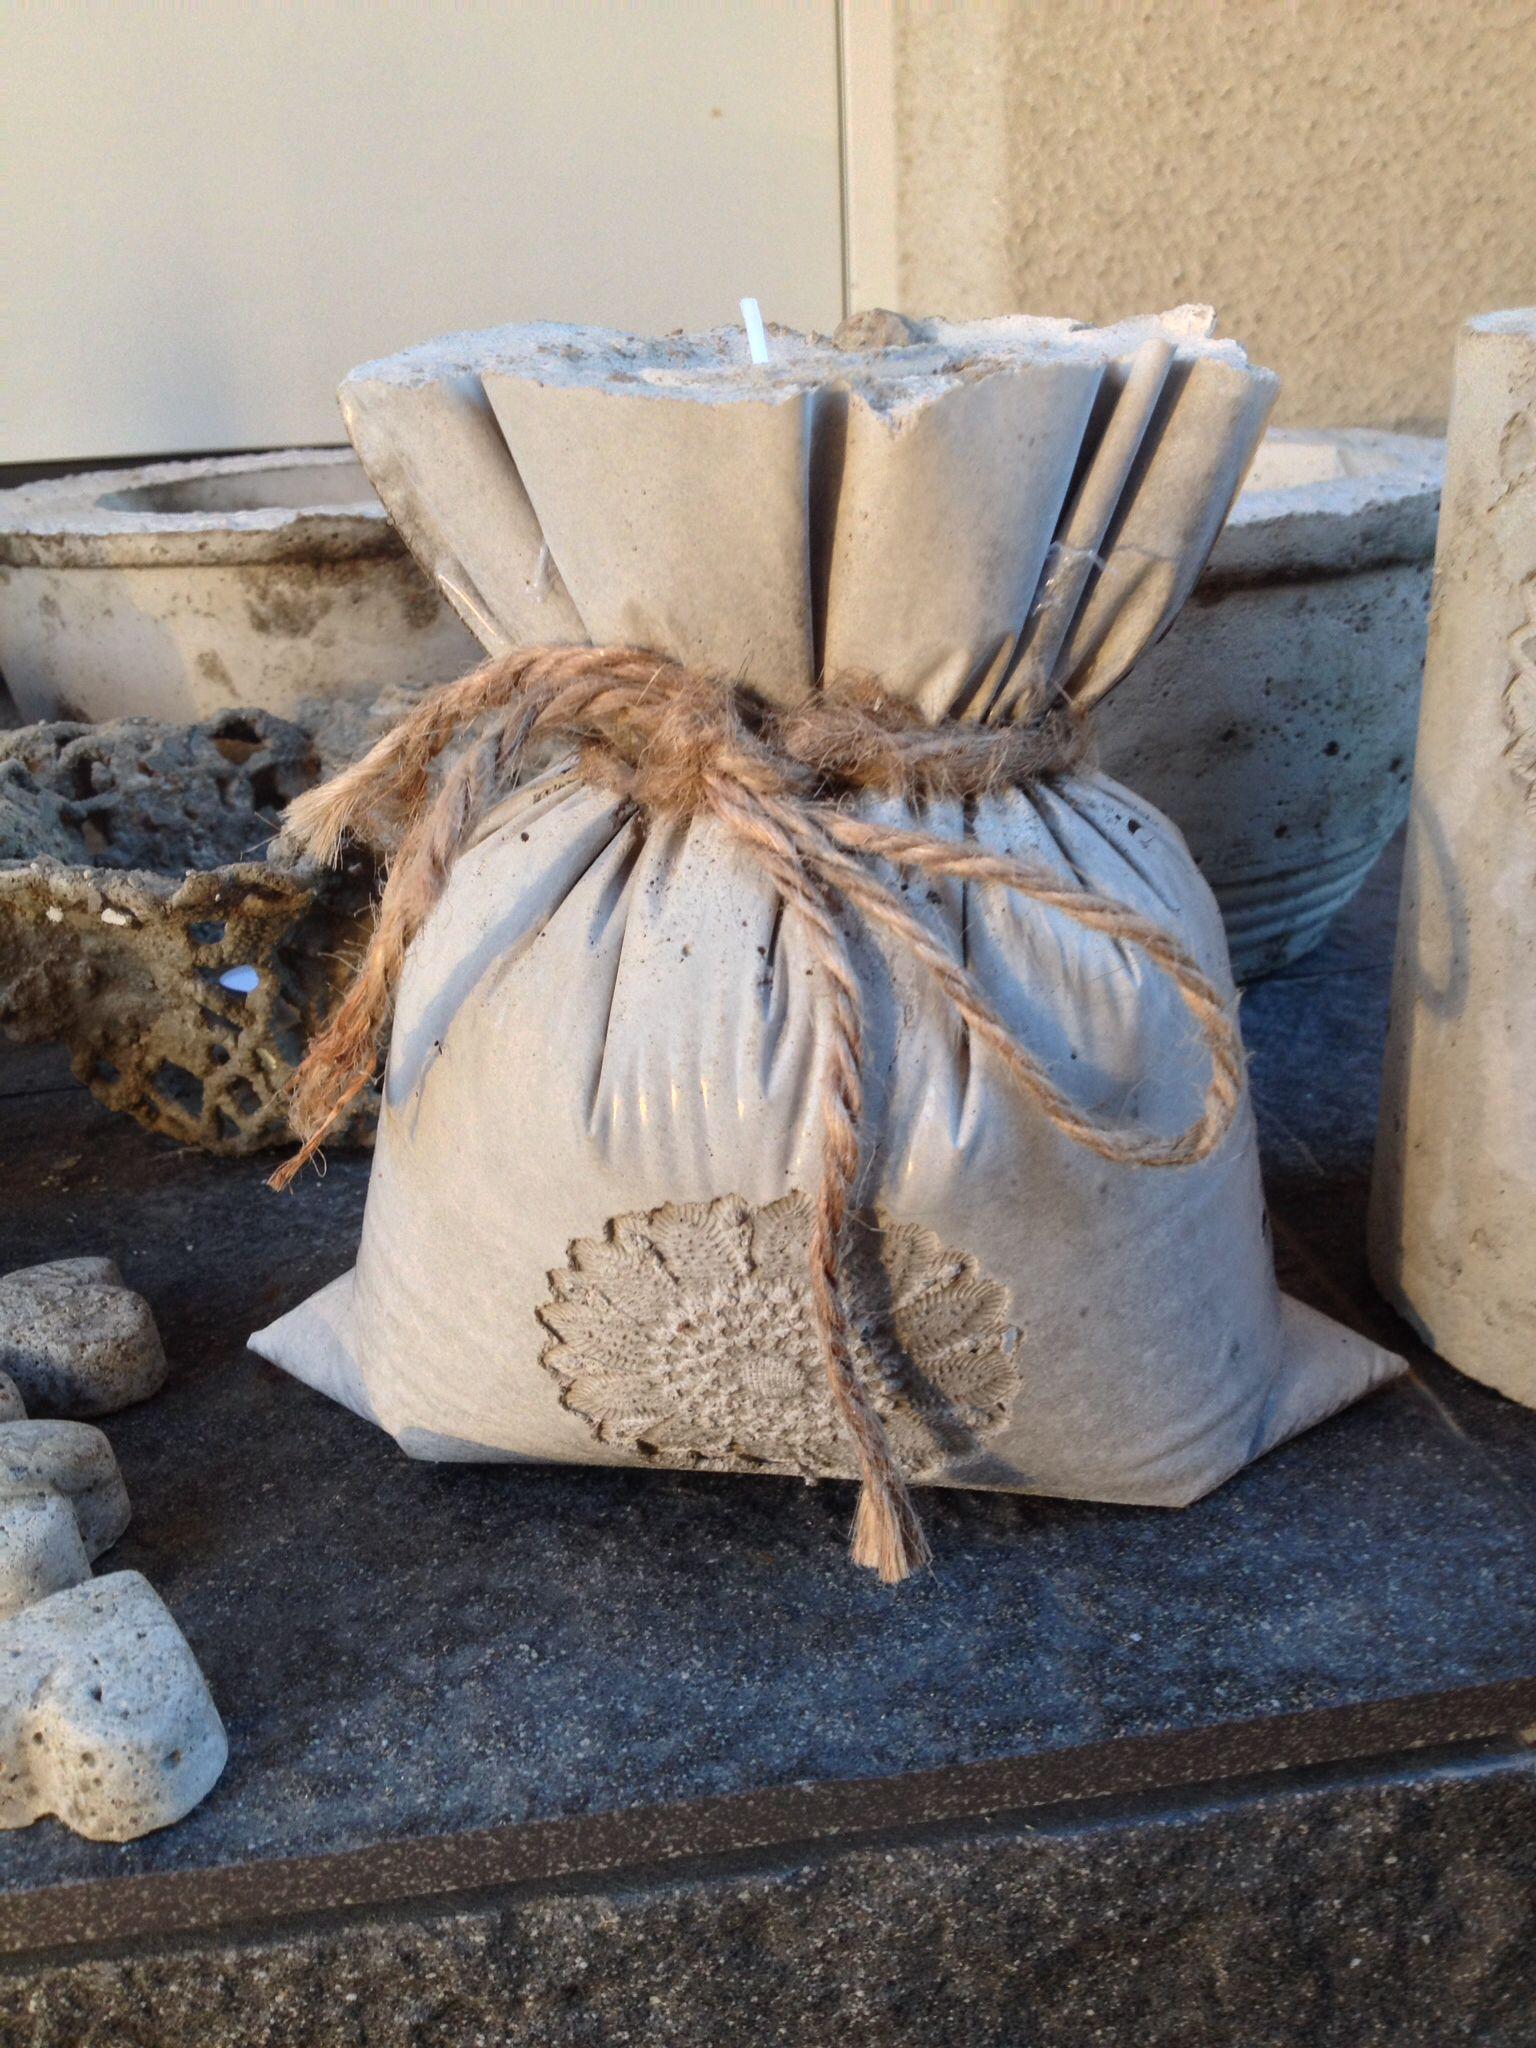 Ovistoppariksi craft pinterest concrete cement - Concrete projects for the garden ...